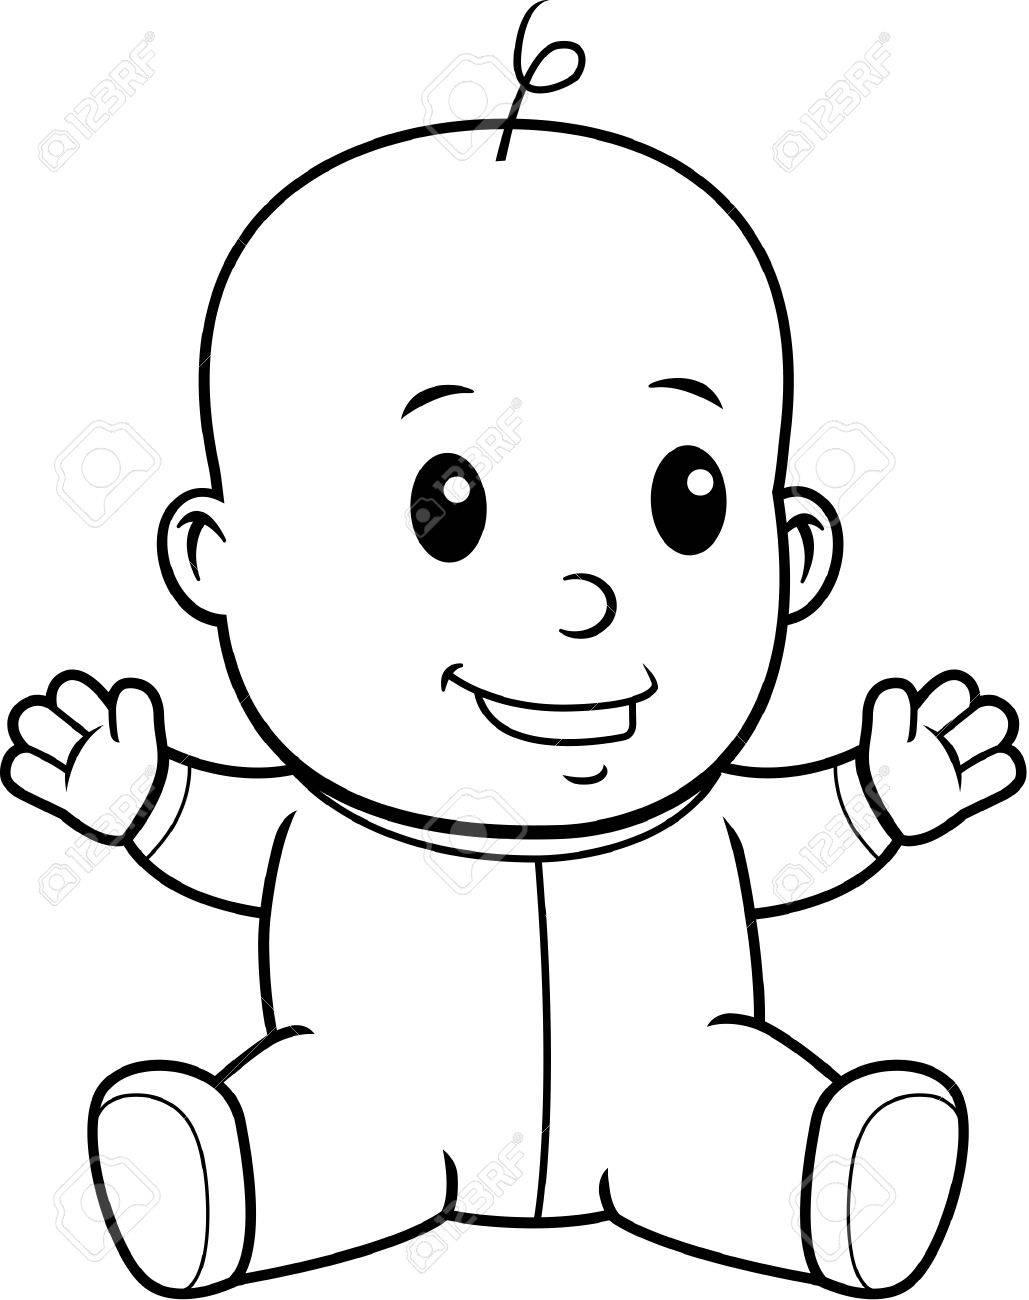 Baby Sitting Drawing At Getdrawings